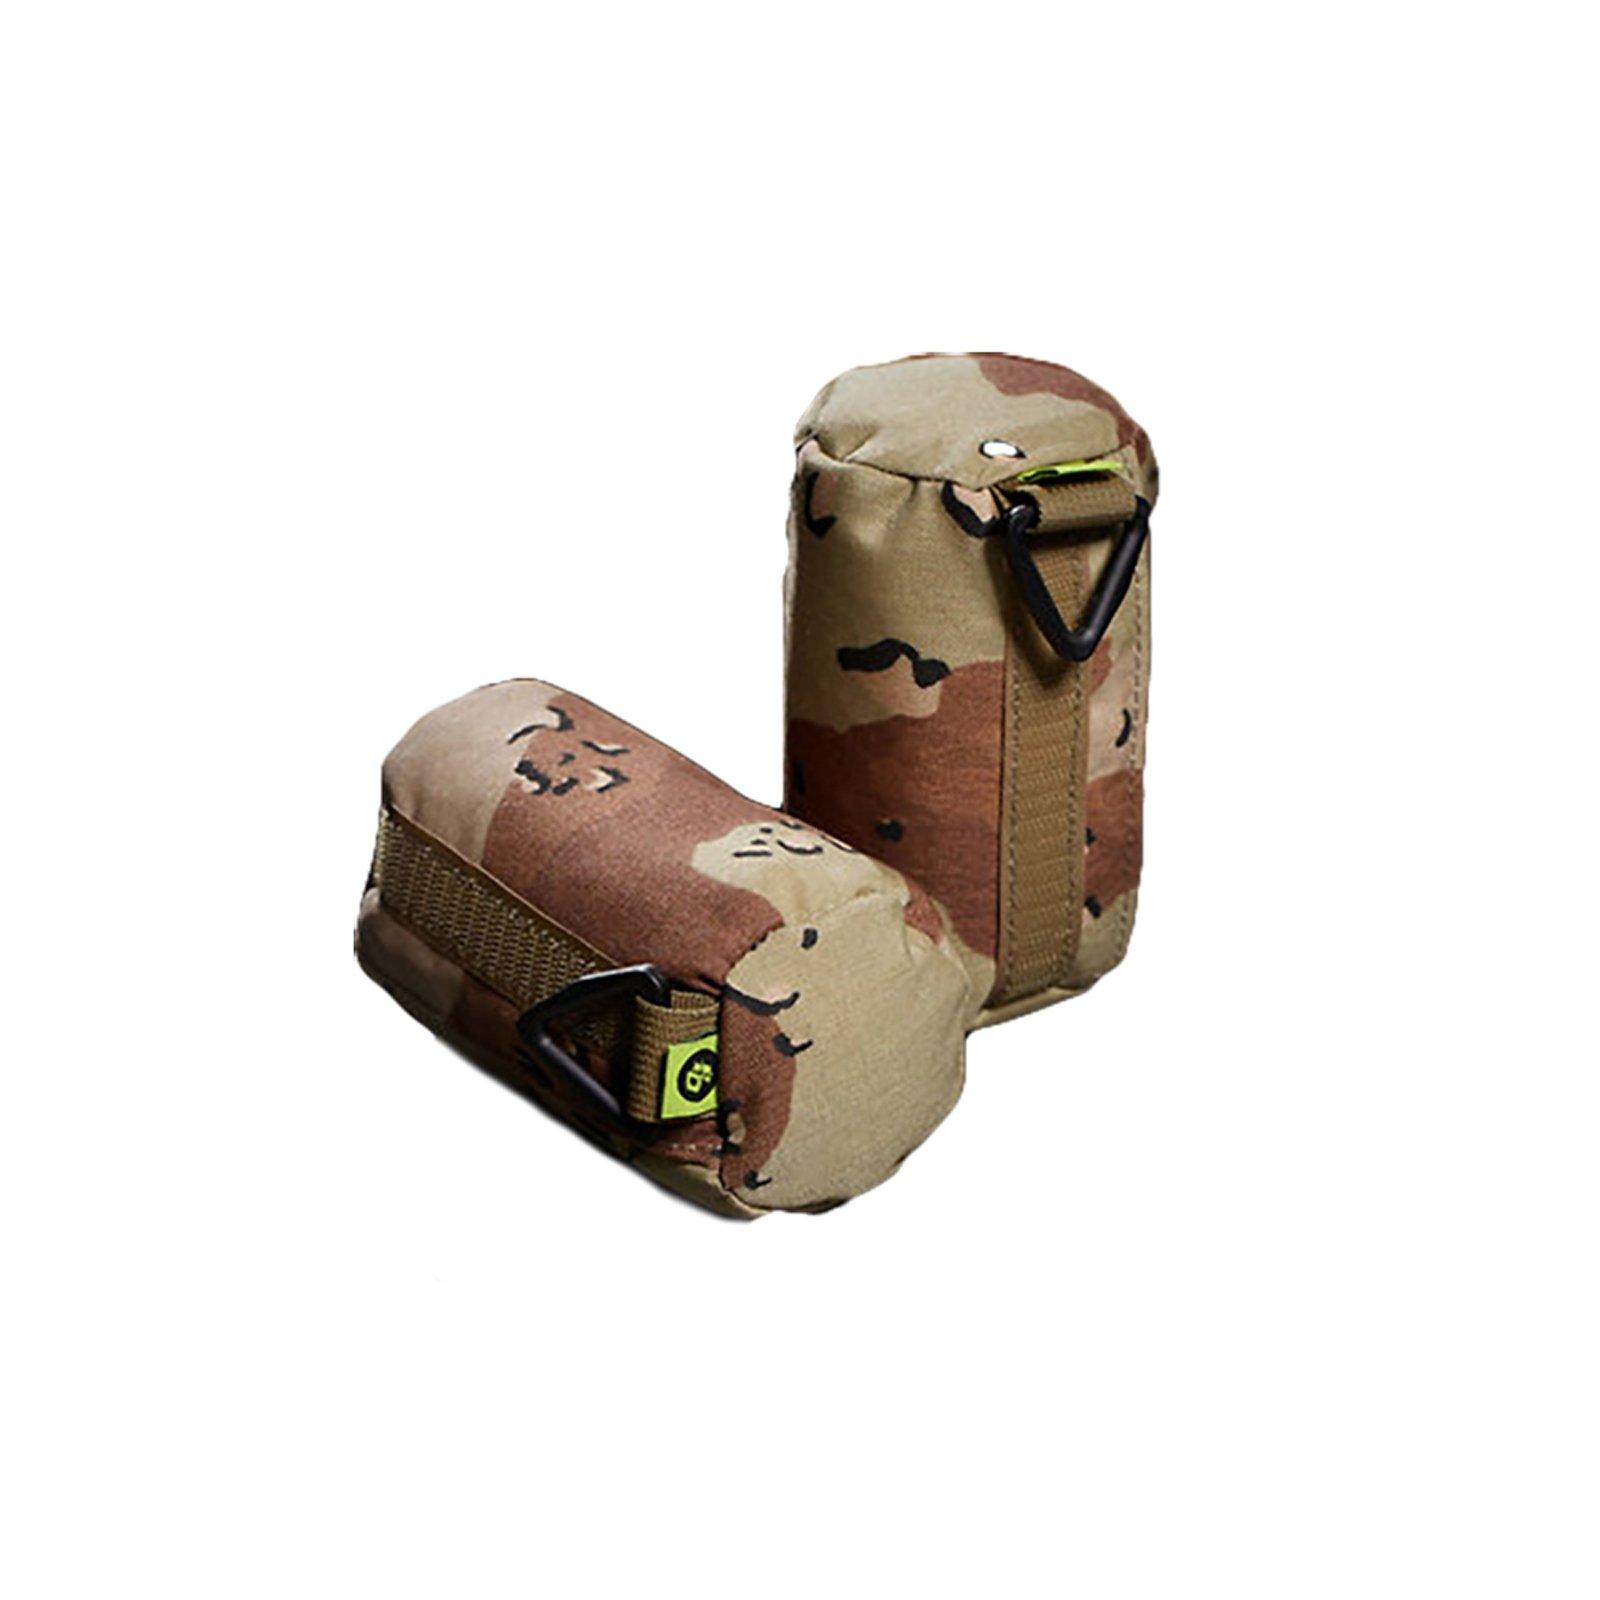 Booster Bag Shooting Bag Lightweight Carry Case Black